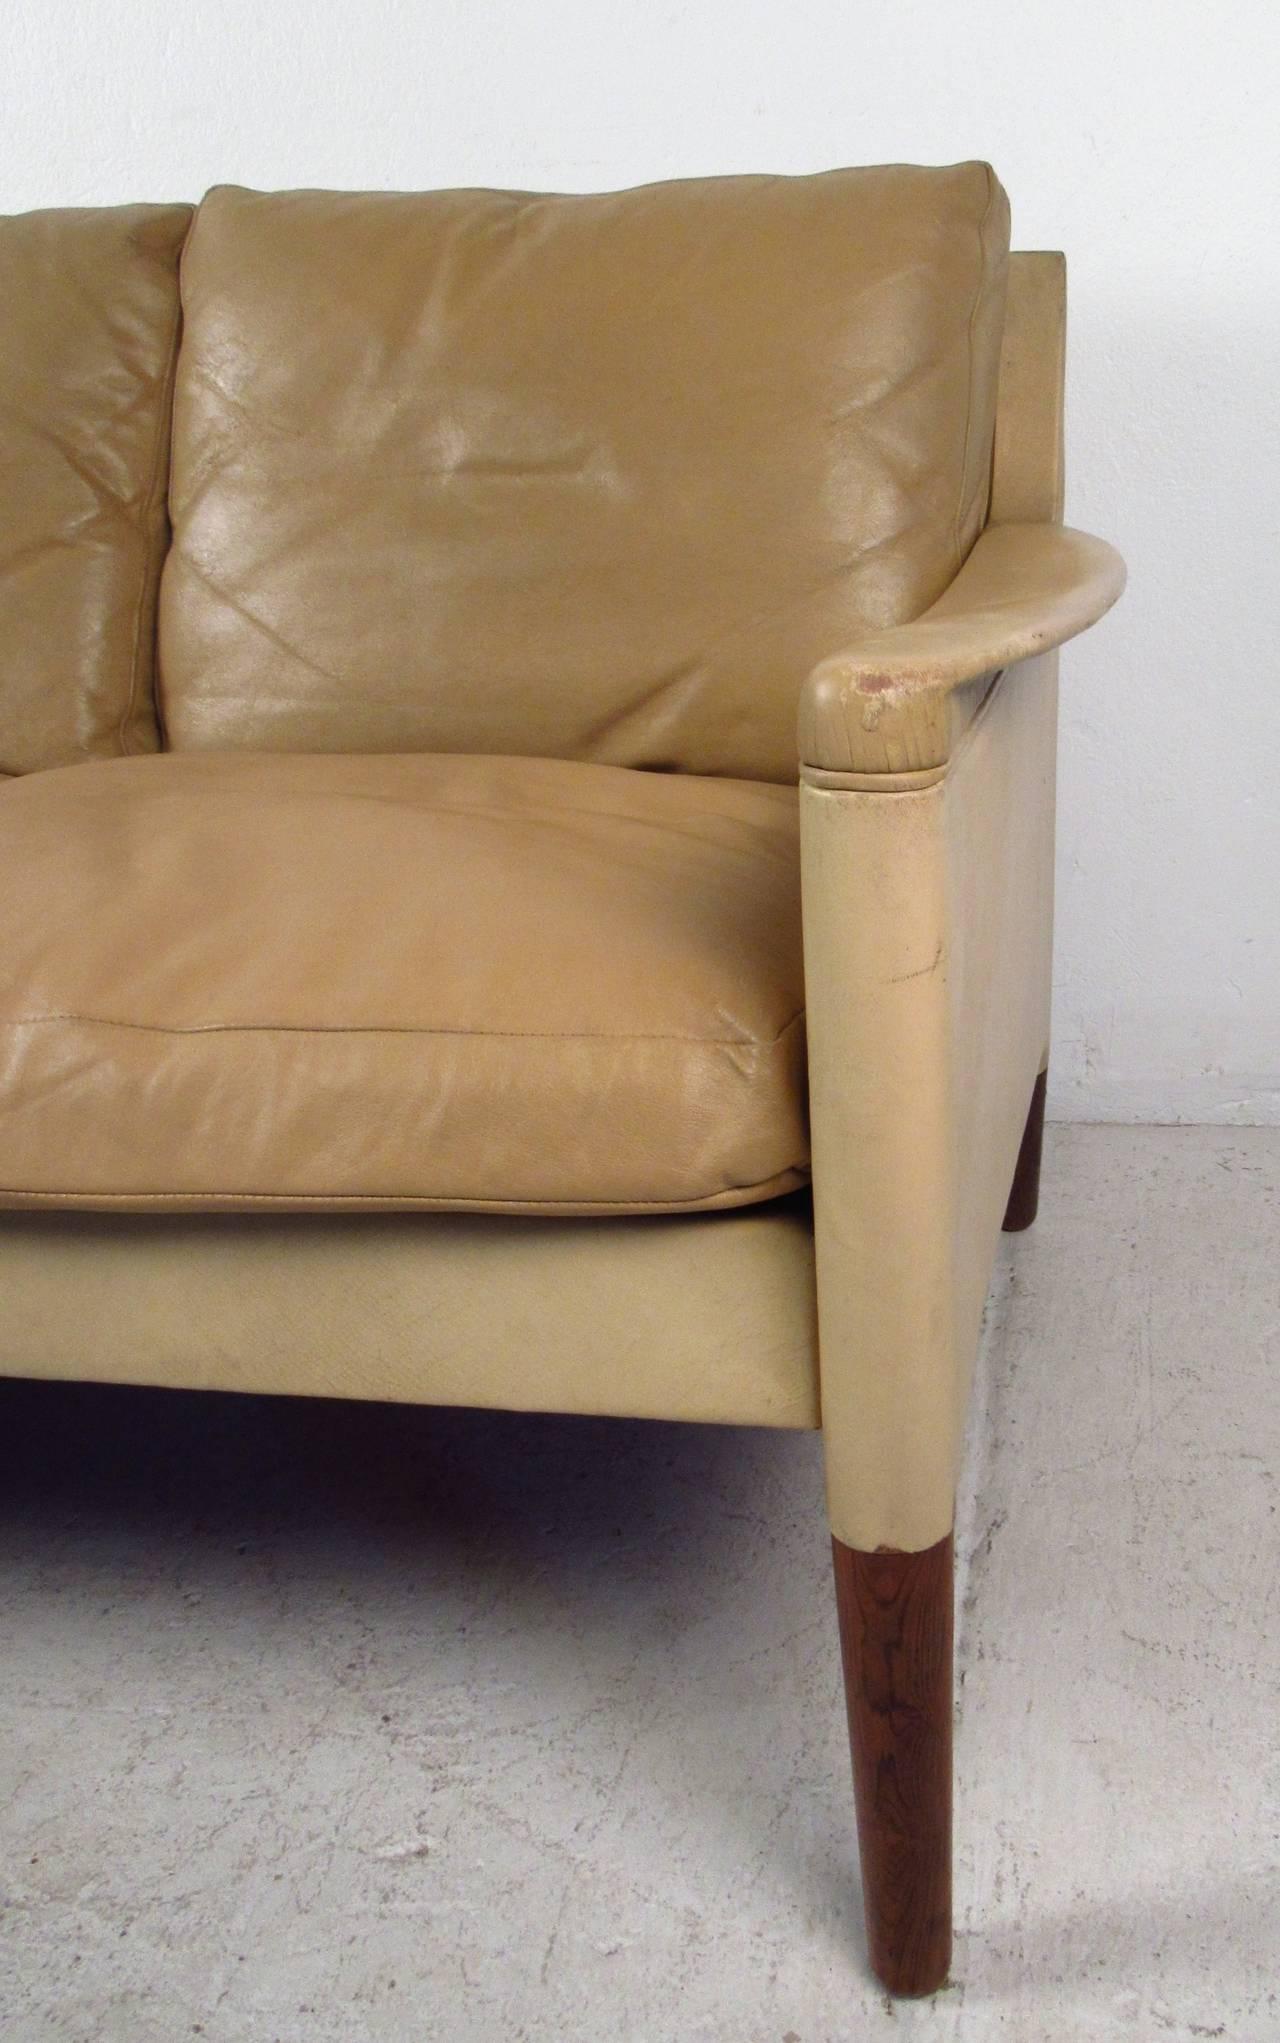 Mid-20th Century Vintage Danish Leather Sofa For Sale